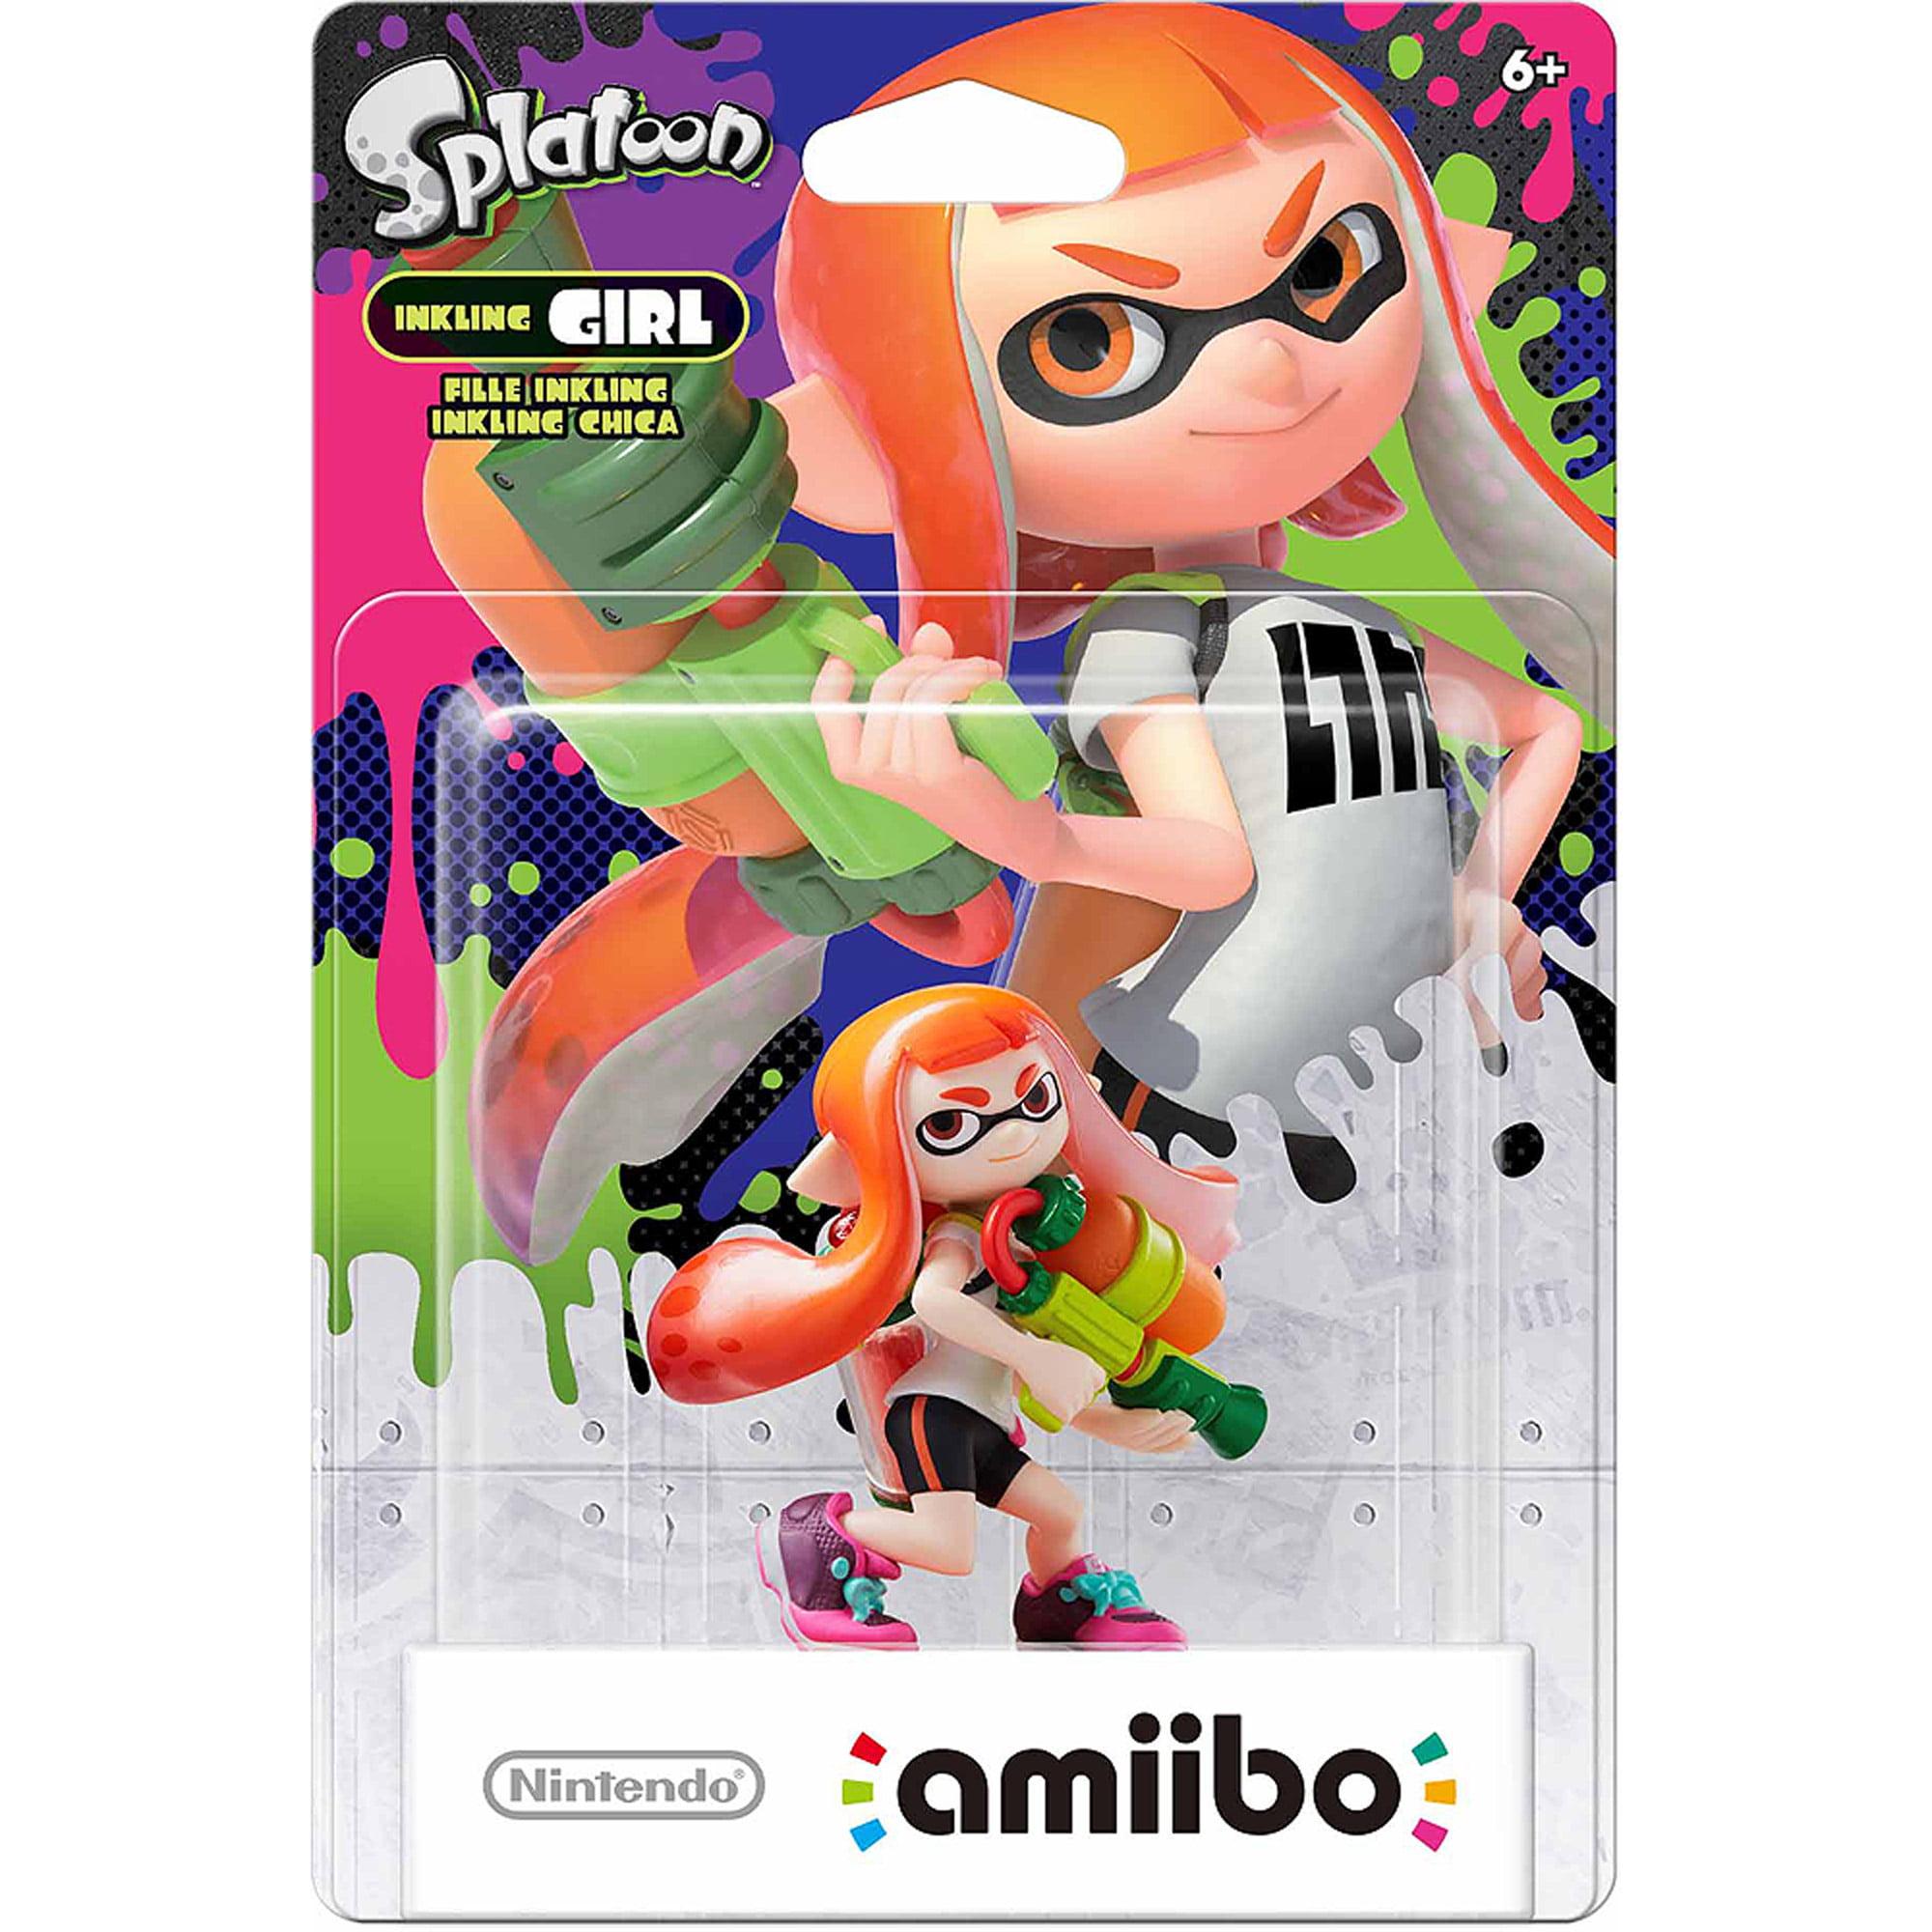 Inkling Girl Splatoon Series Amiibo (Nintendo WiiU or Nintendo 3DS) by Nintendo